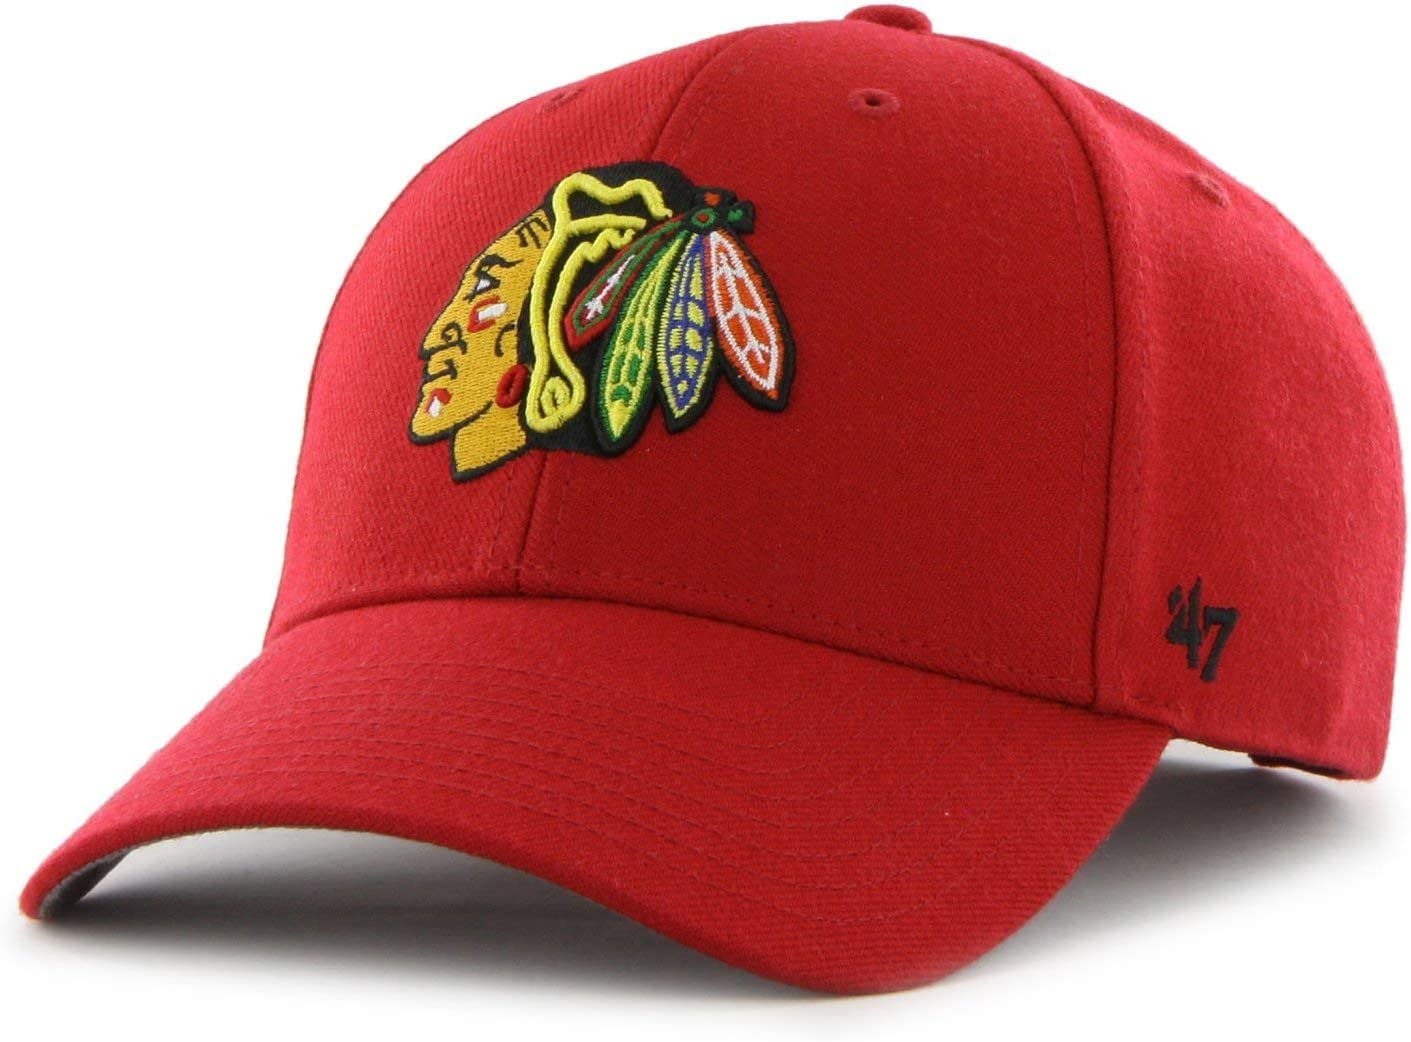 MVP Chicago Blackhawks red 47 Brand Adjustable Cap